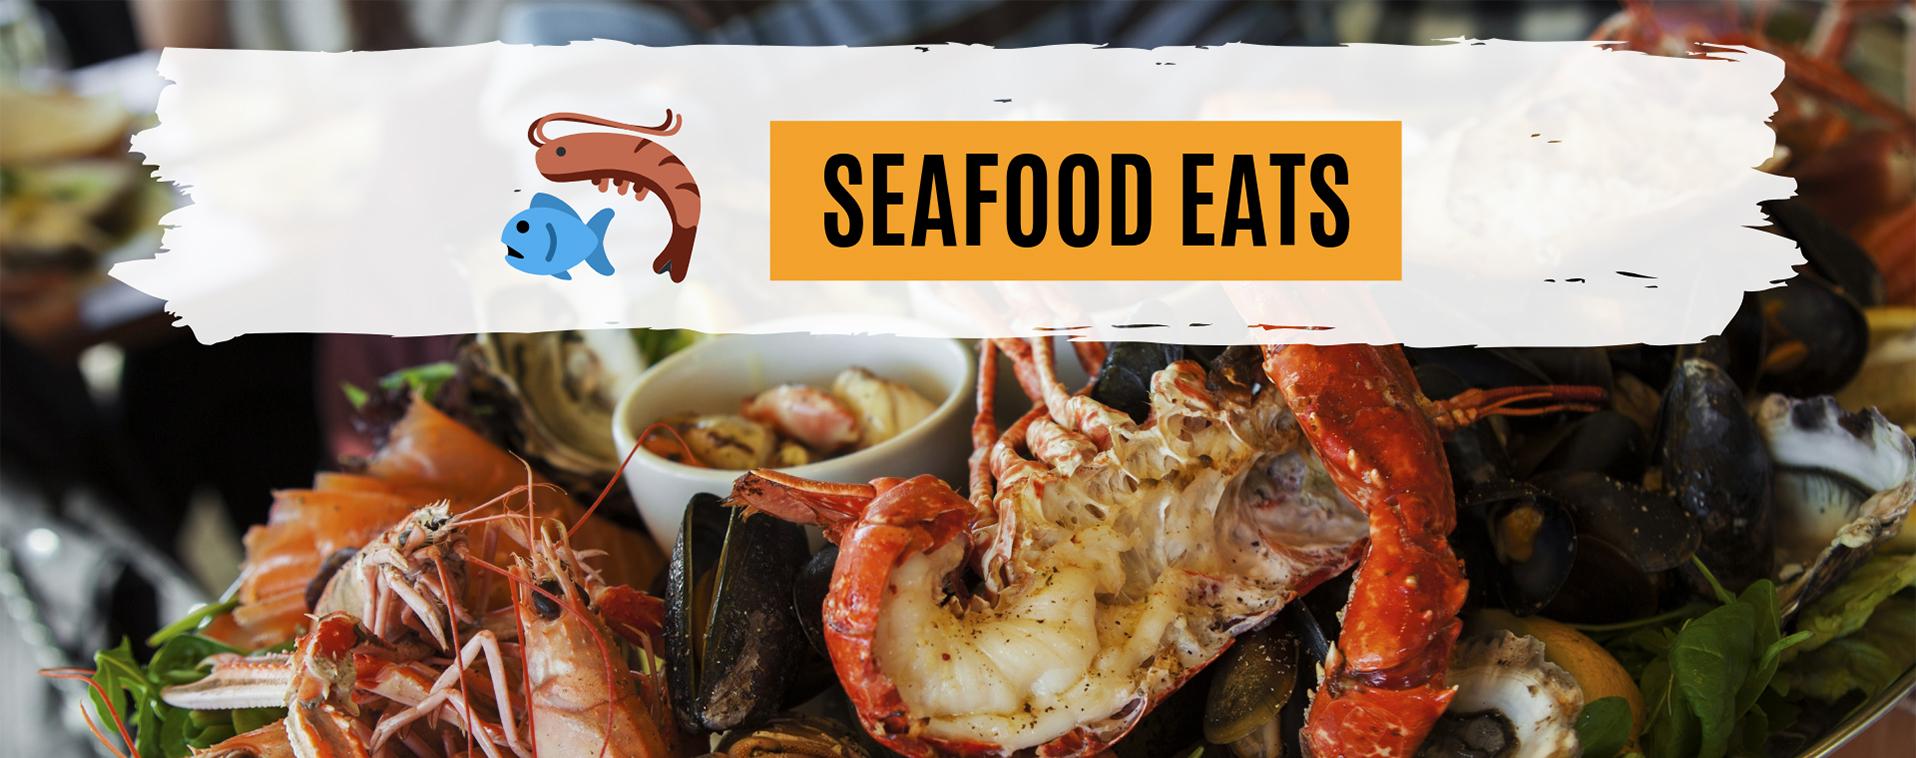 Seafood Eats 1916x758